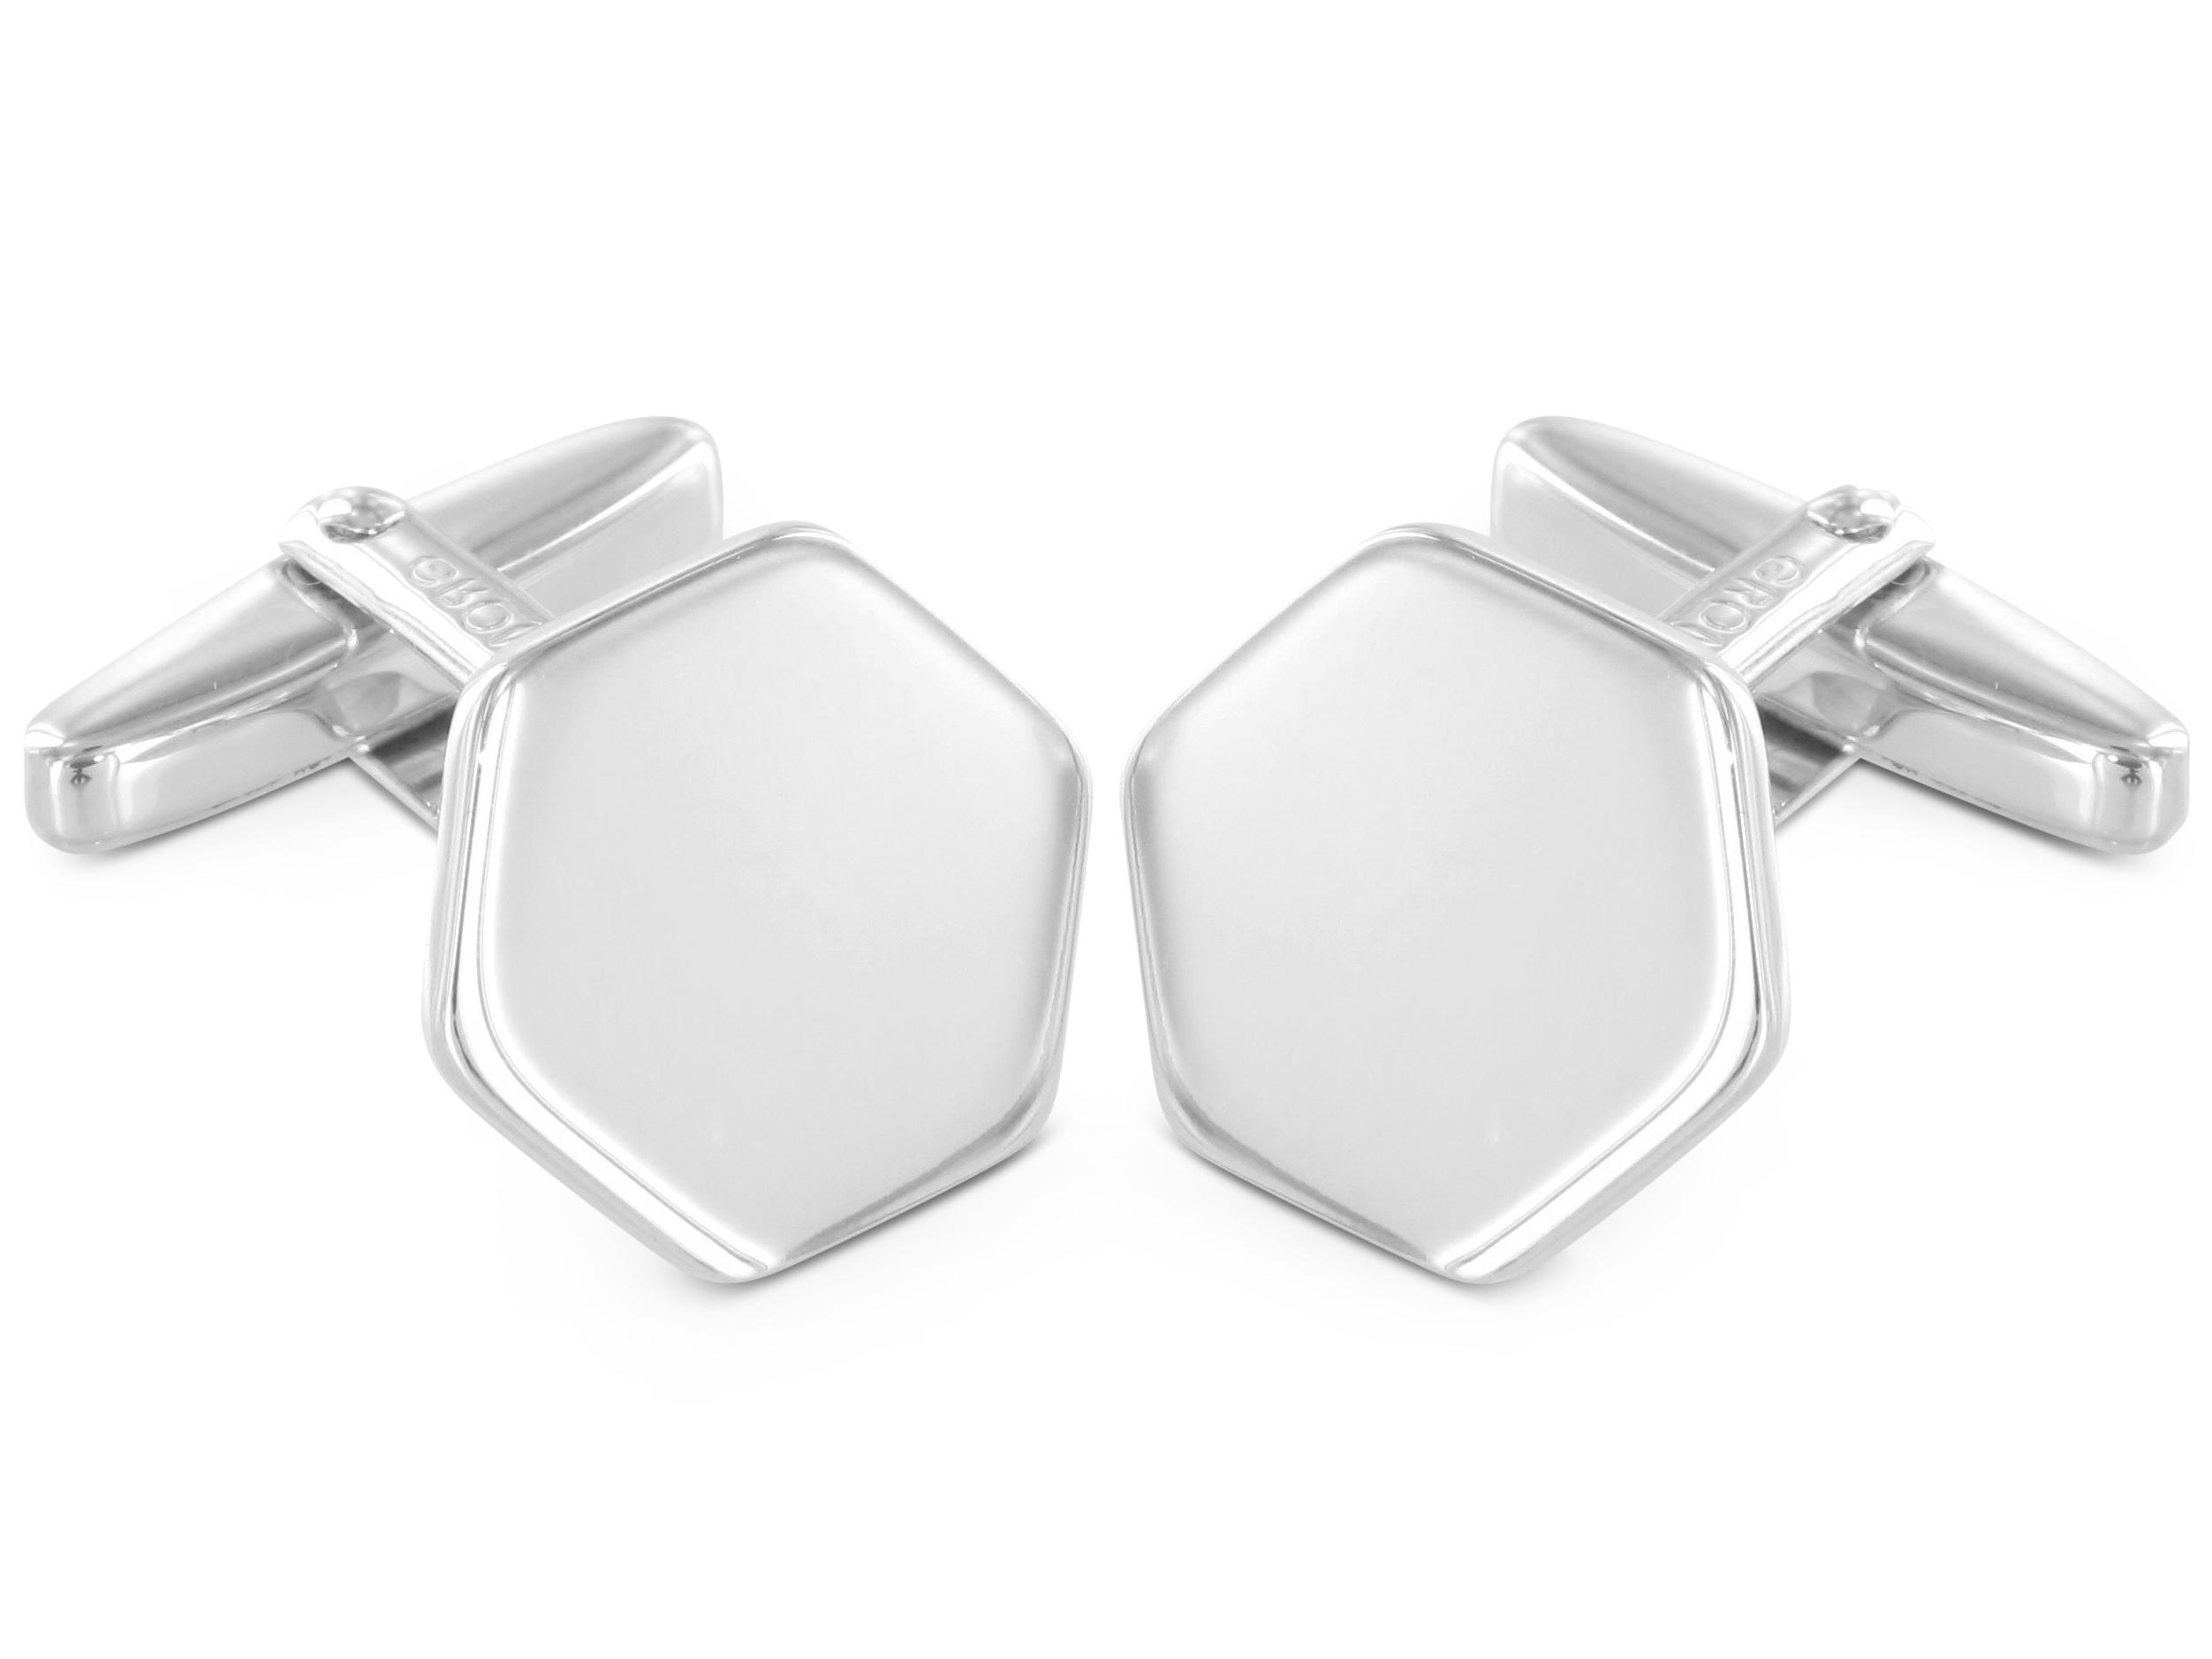 Grom Gravur Manschettenknöpfe Hexagon Silber